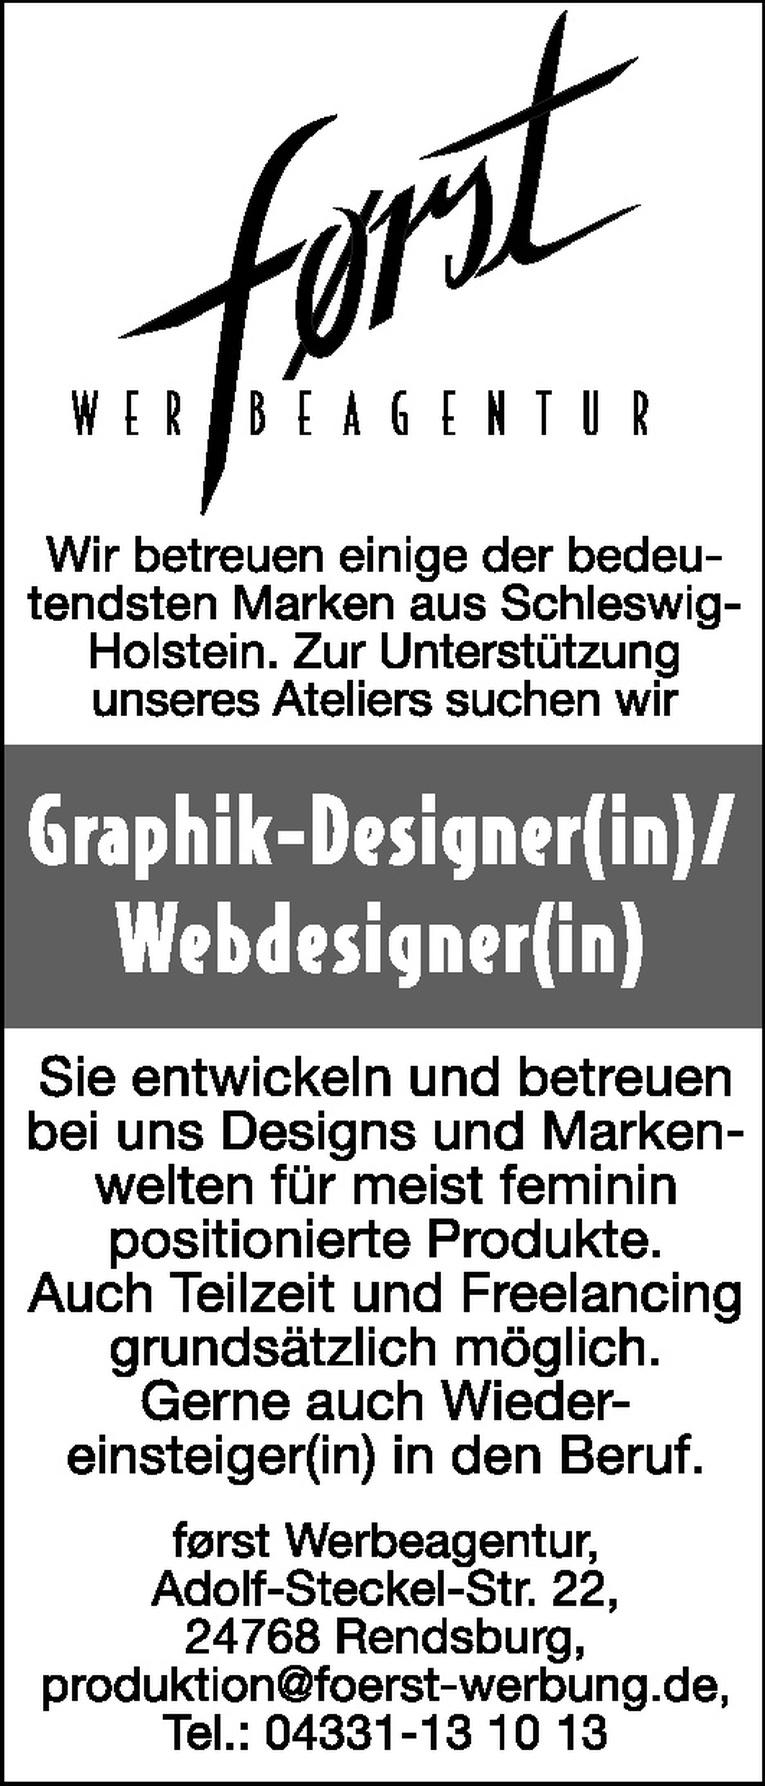 Graphik-Designer(in)/Webdesigner(in)